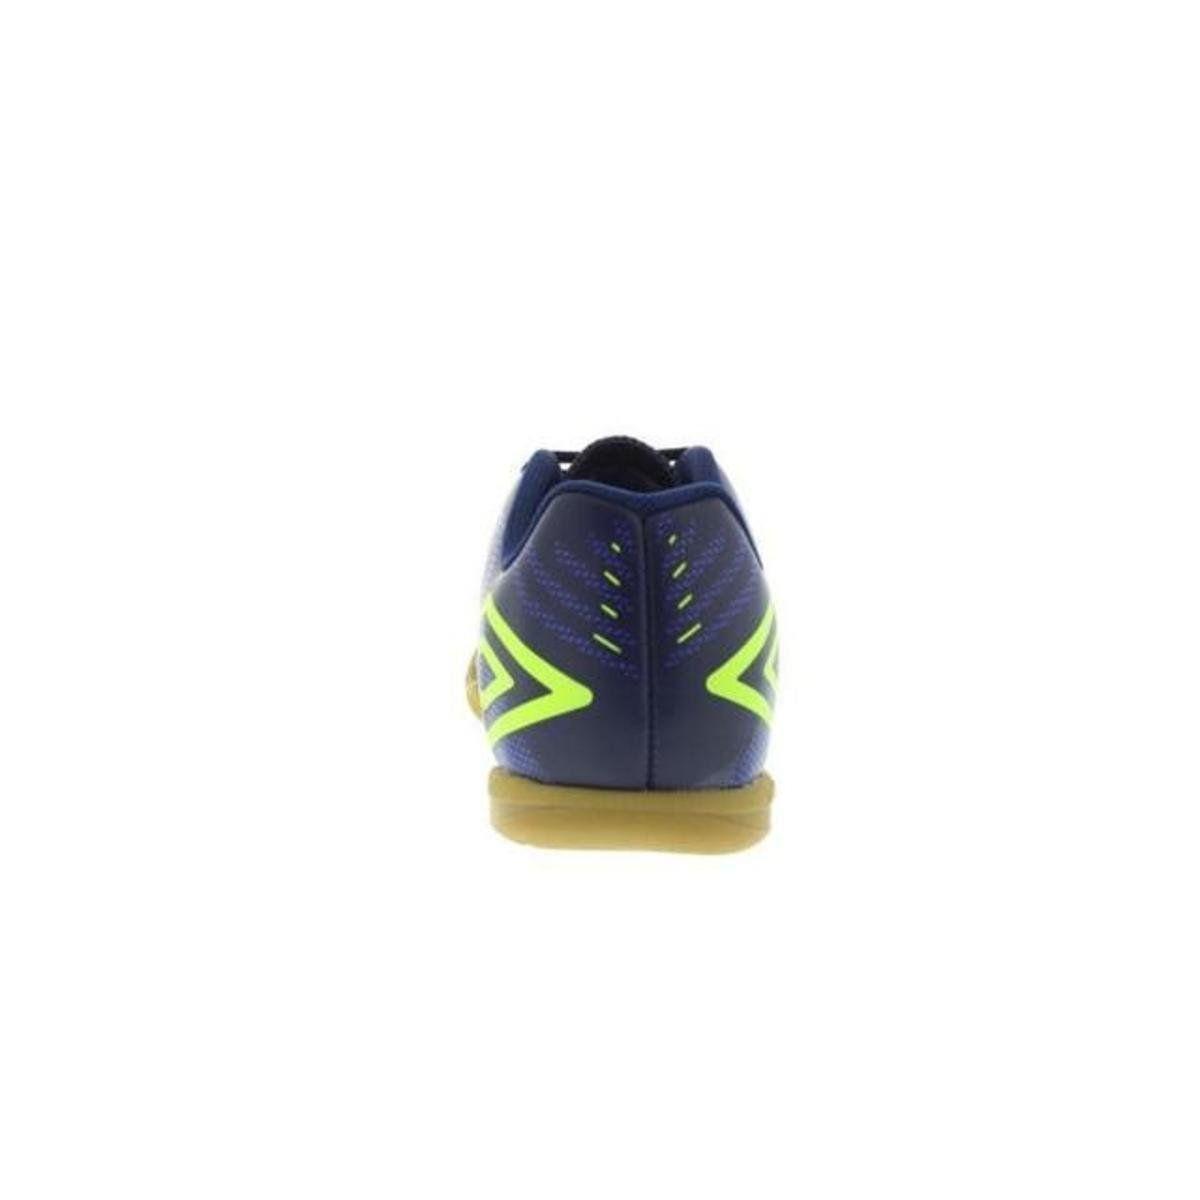 Chuteira Infantil Masculina Umbro Speed IV JR Futsal - Marinho